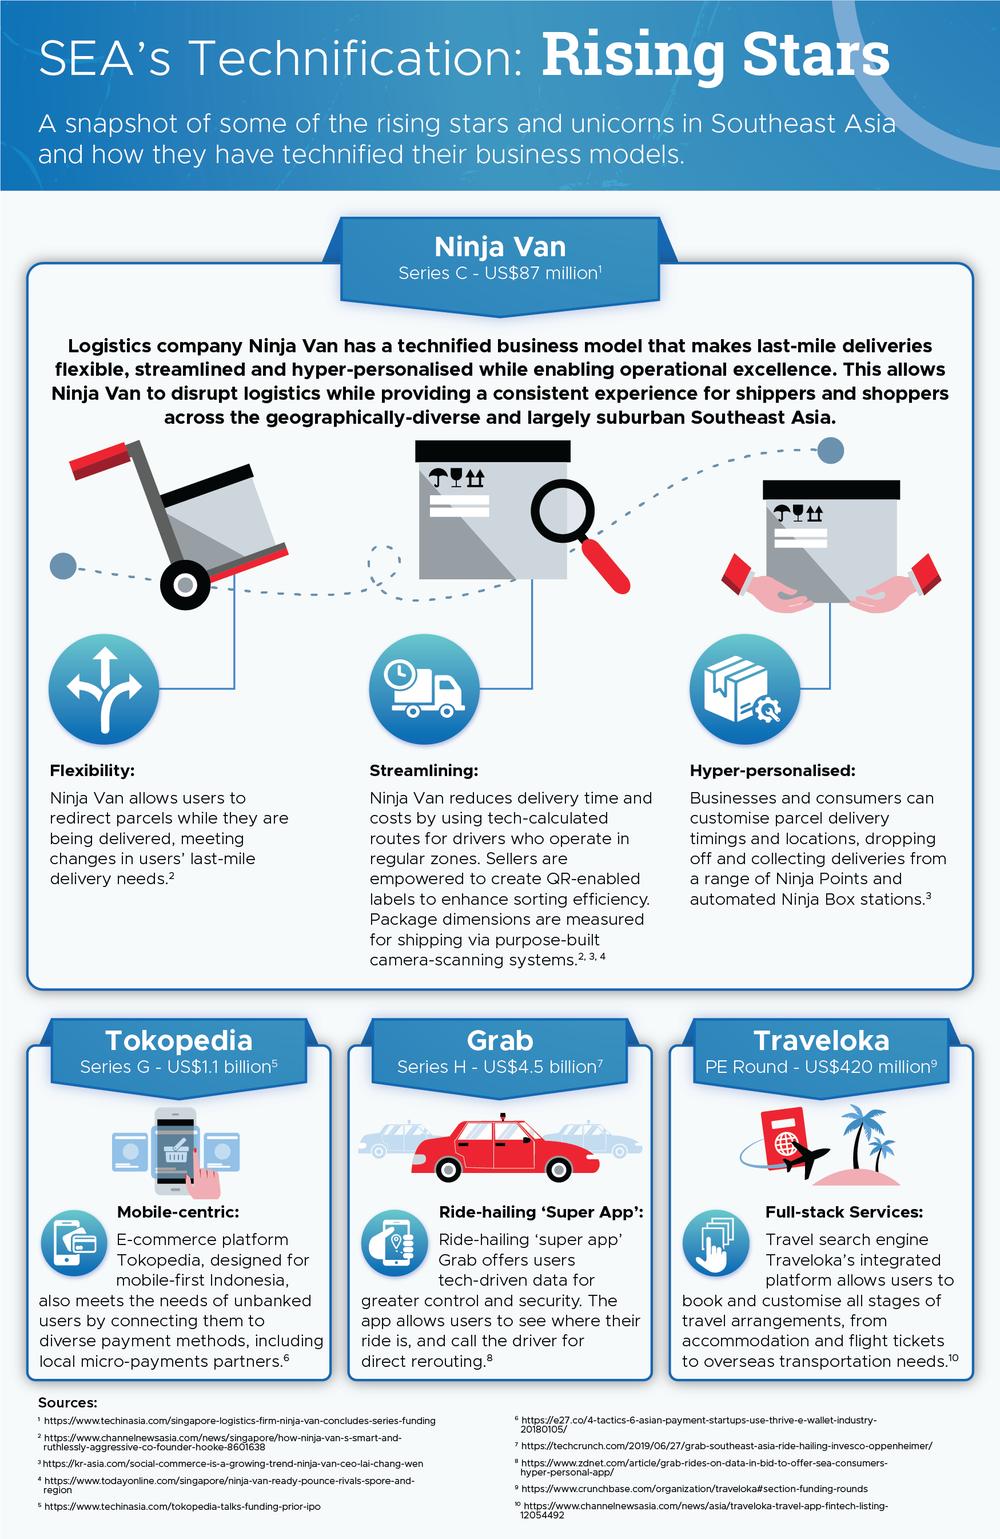 SEA Technification - Ninja Van, Tokopedia, Grab, Traveloka